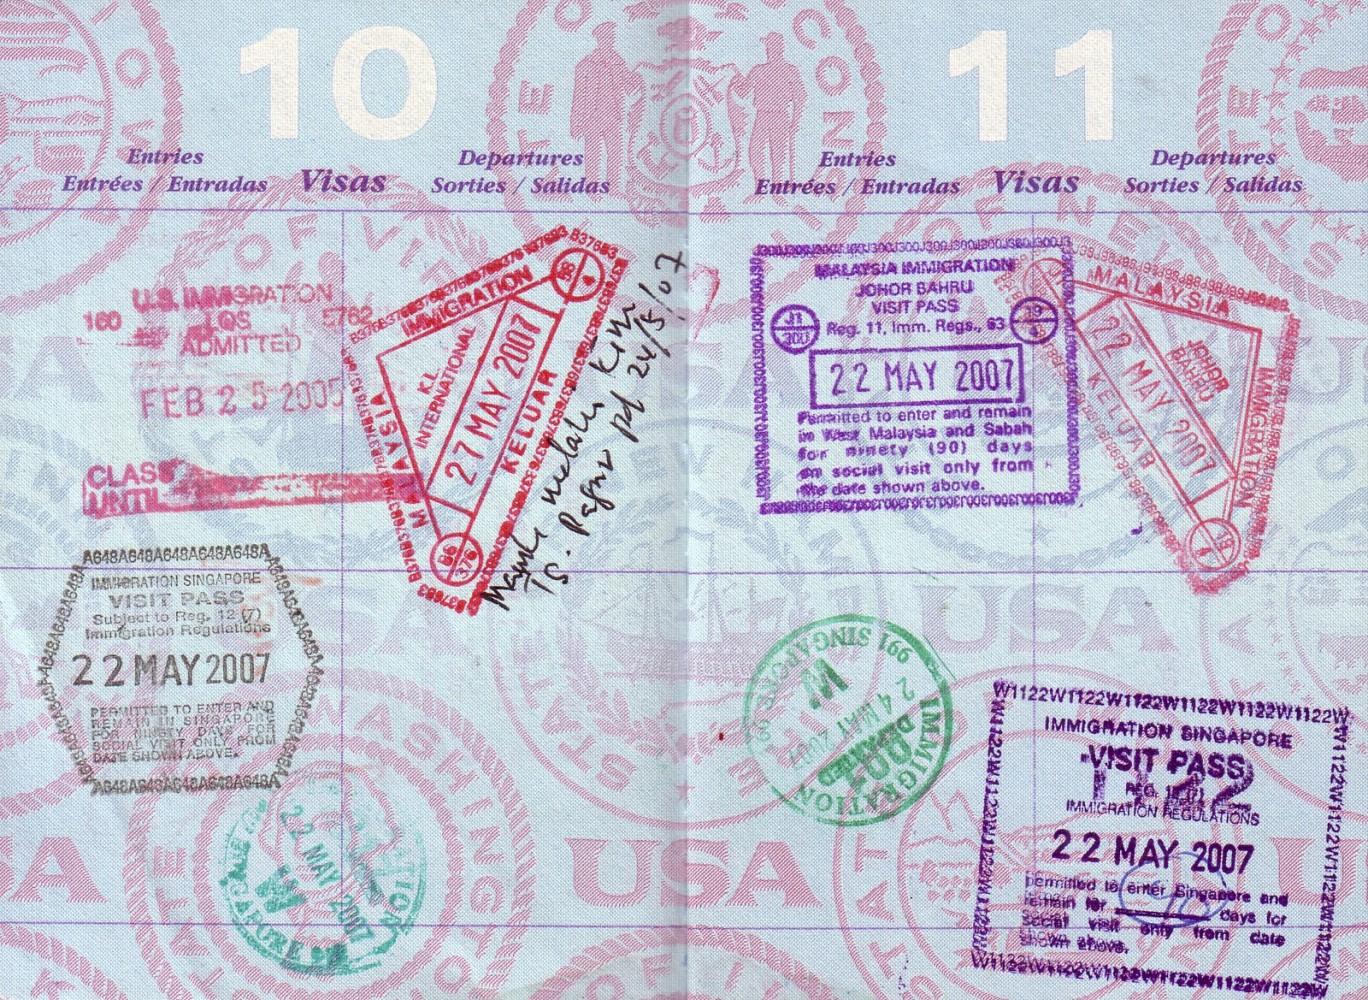 Visa image